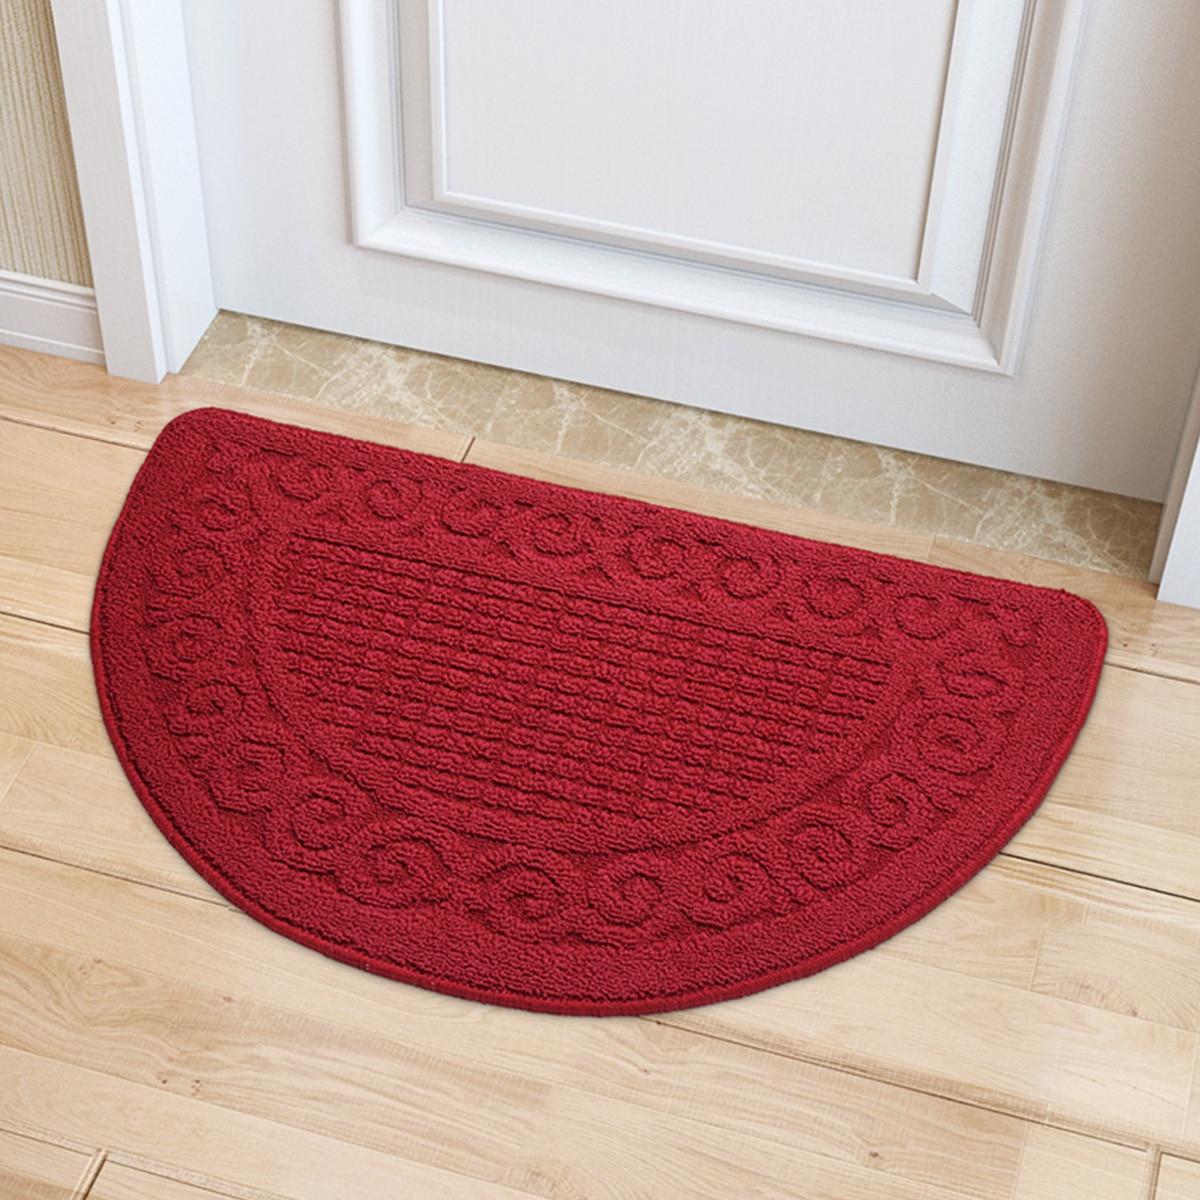 Semi circle bath mat clipsal ceiling speakers